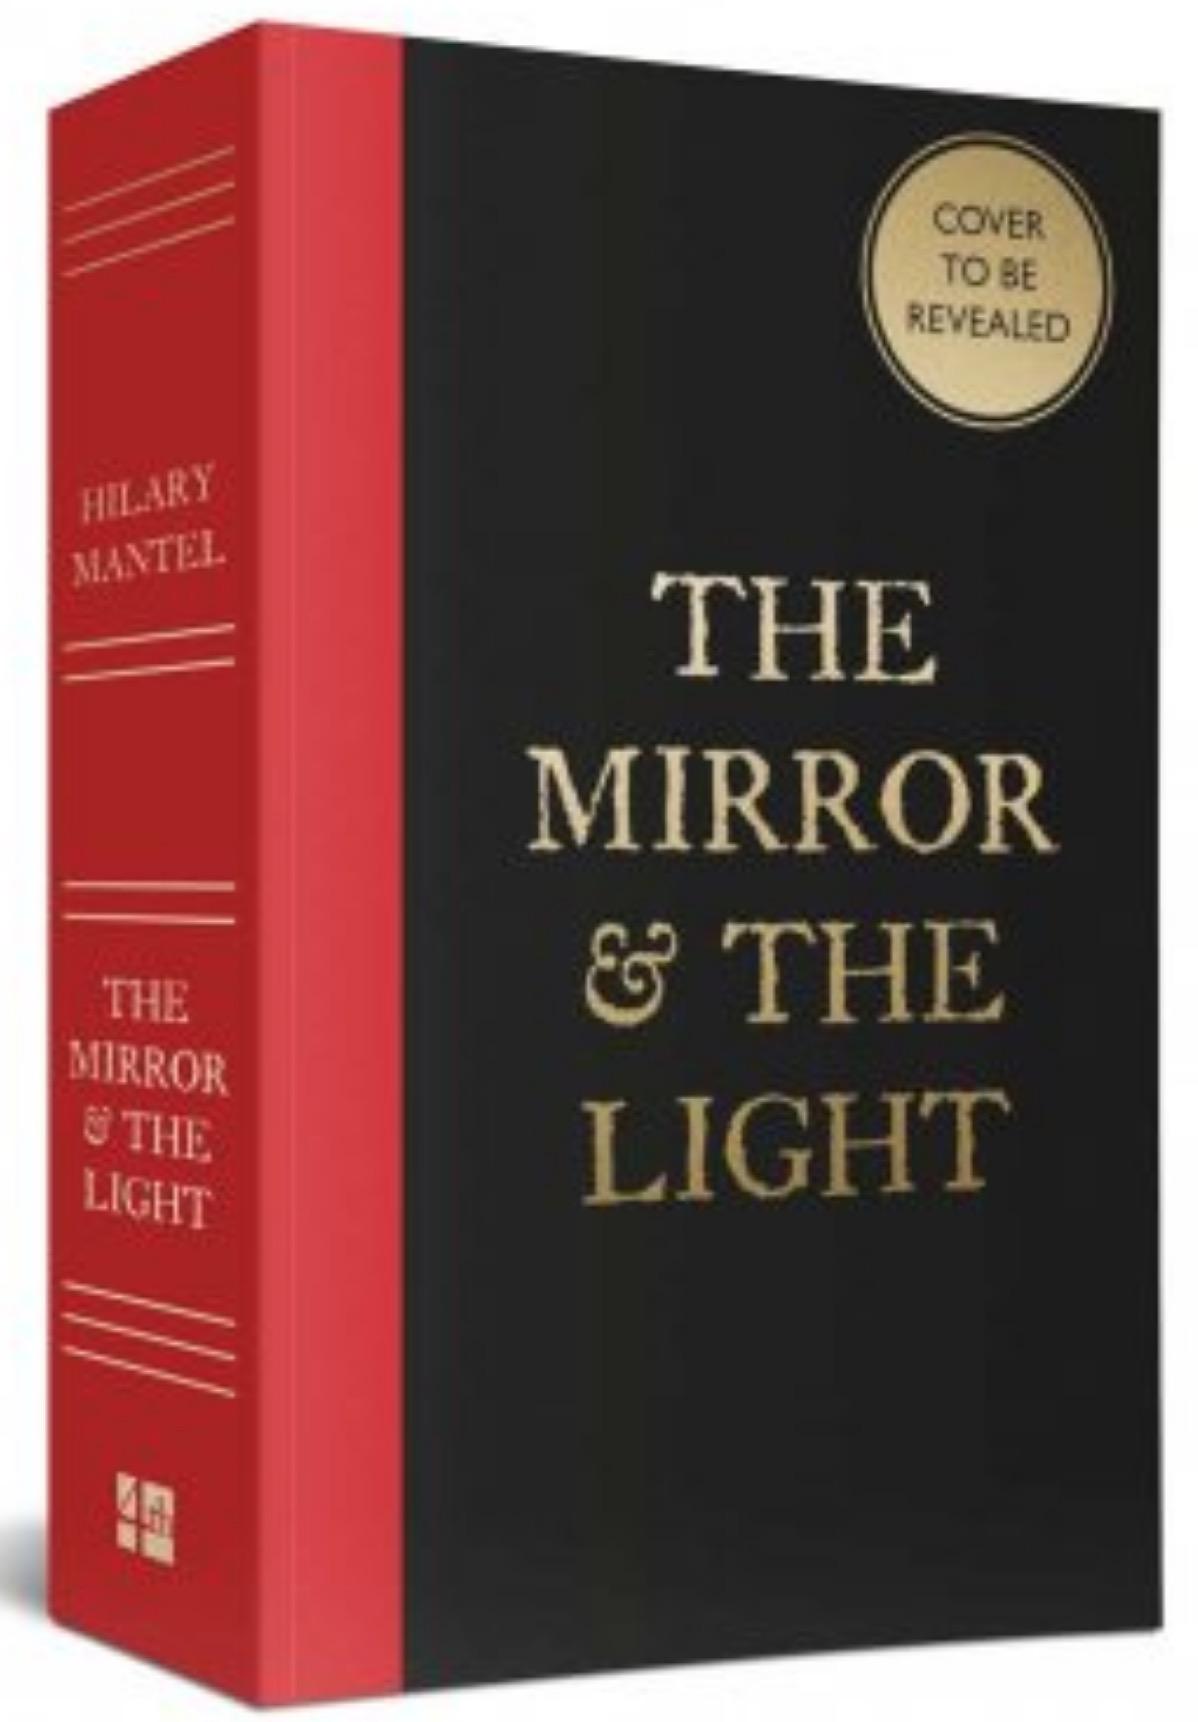 hilary mantel mirror light tease cover ltd